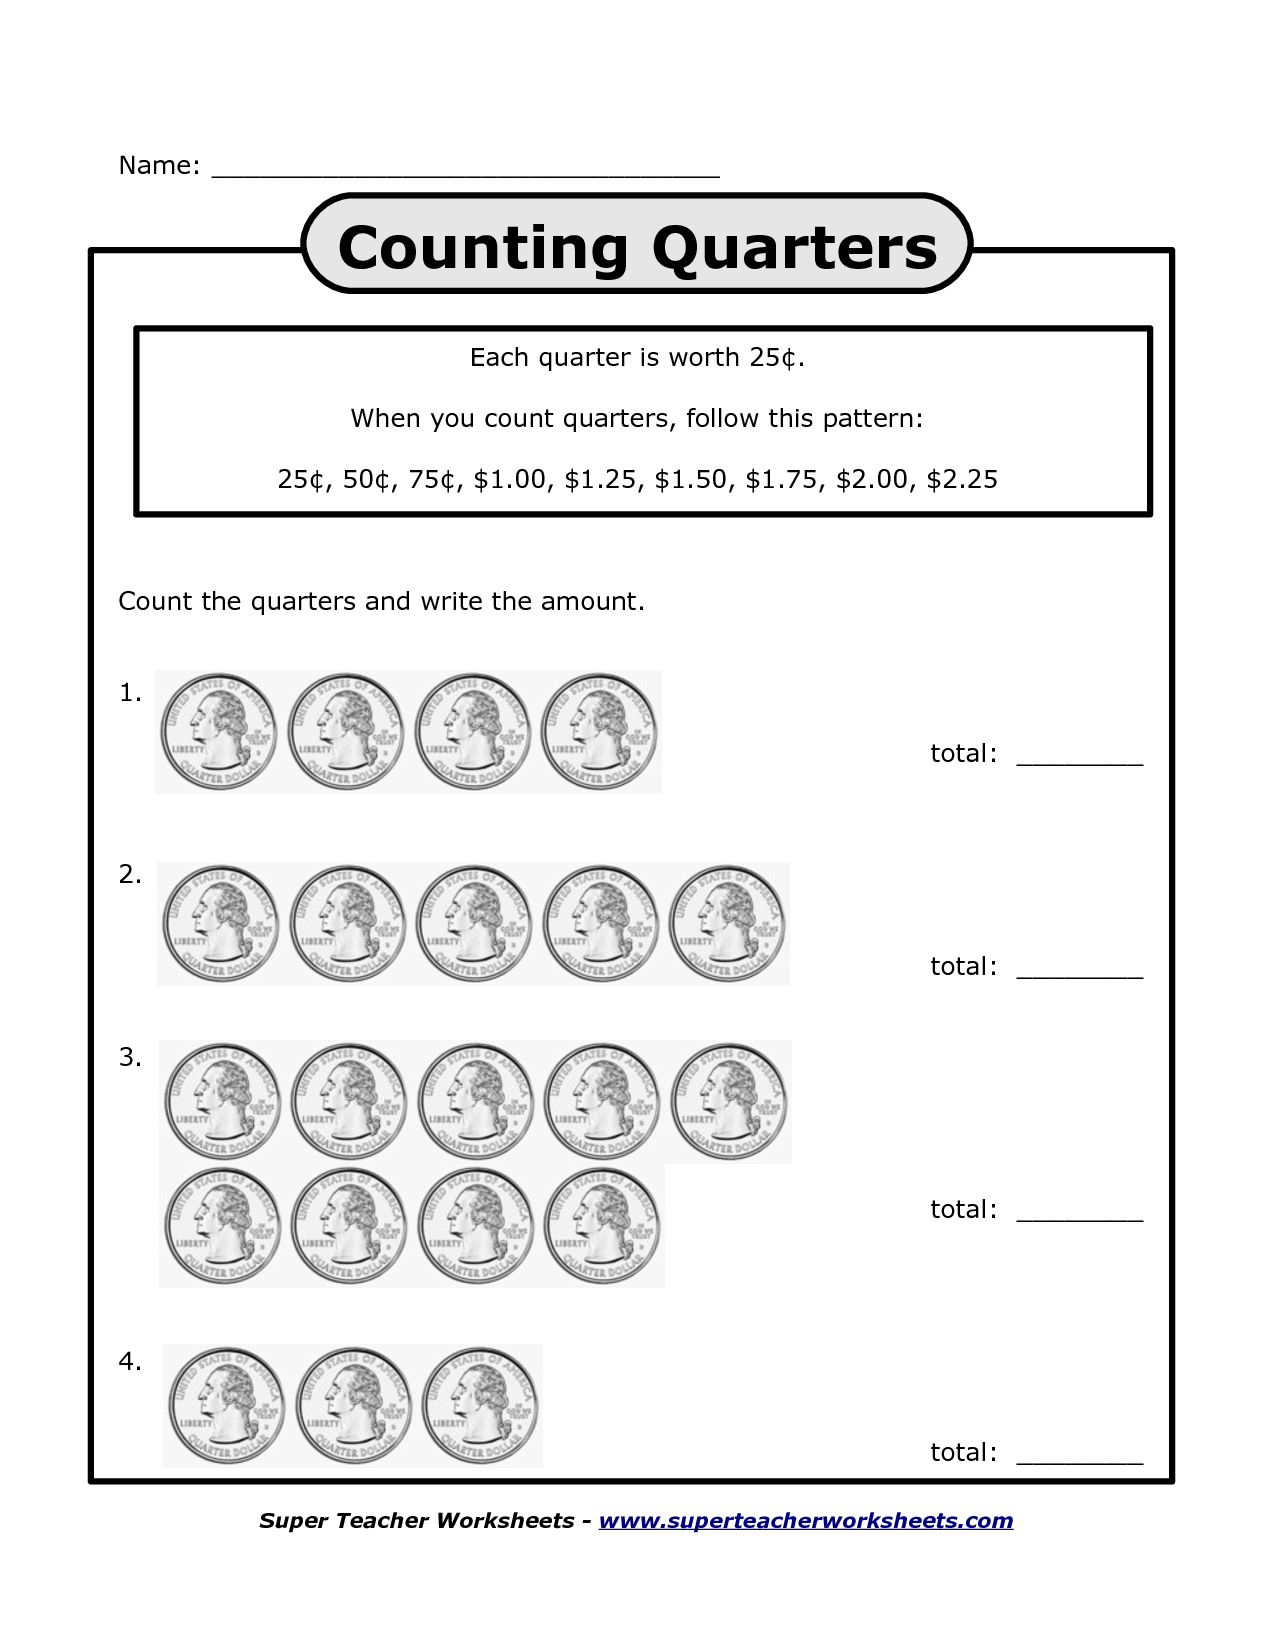 Counting Quarters Worksheets - Bing Images   Super teacher worksheets [ 1650 x 1275 Pixel ]